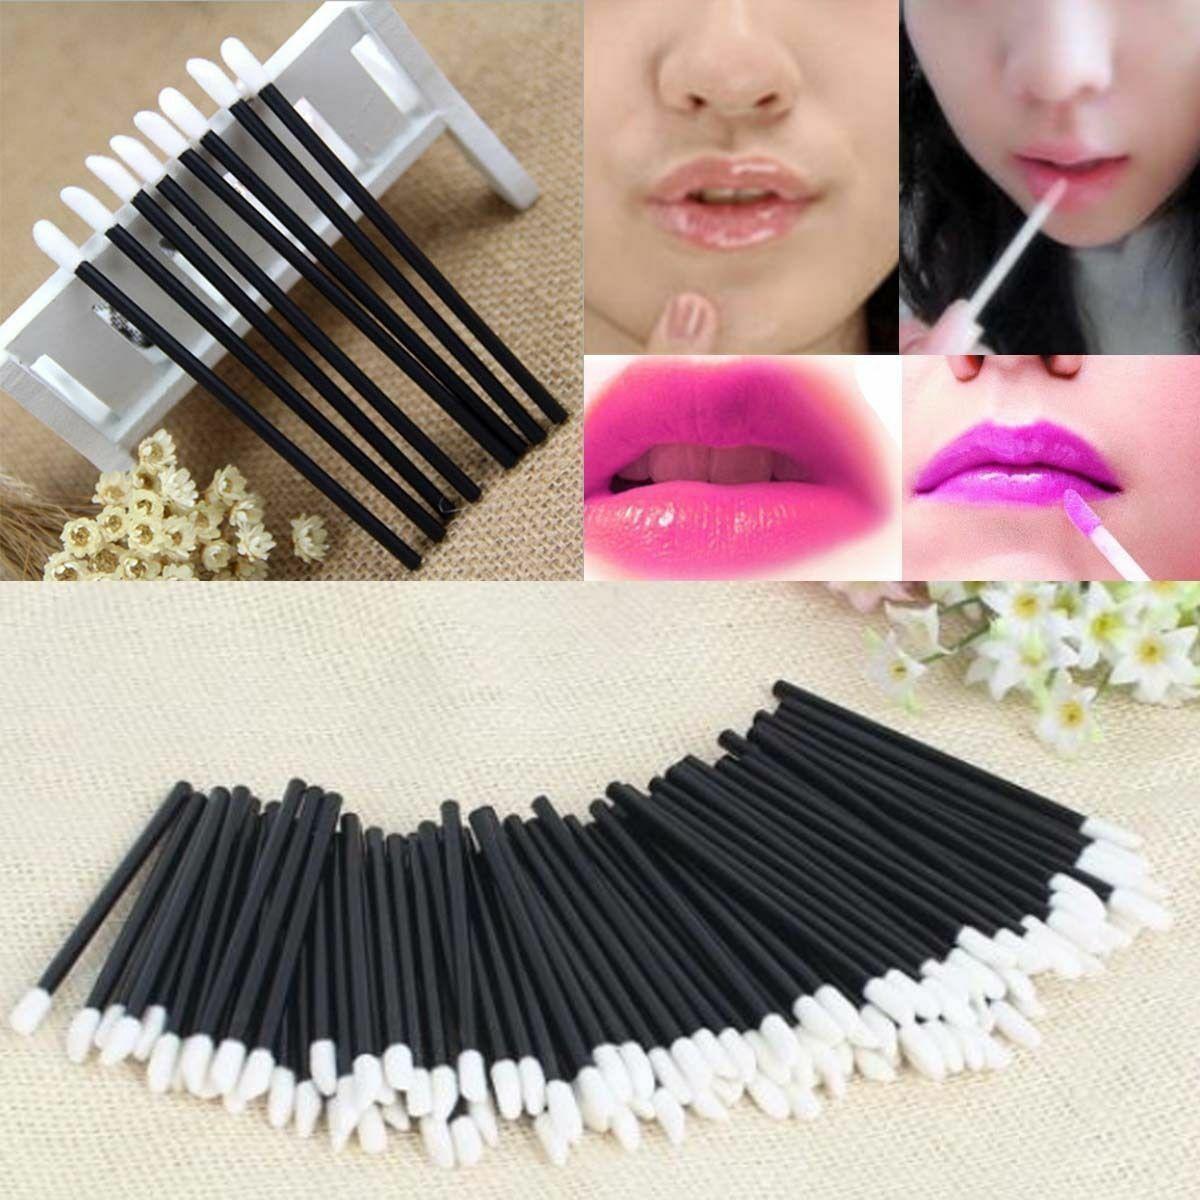 100 Pcs Disposable Lip Brush Eyelash Makeup Brushes Lash Extension Mascara Applicator Lipstick Wands Set Cosmetic Makeup Tools